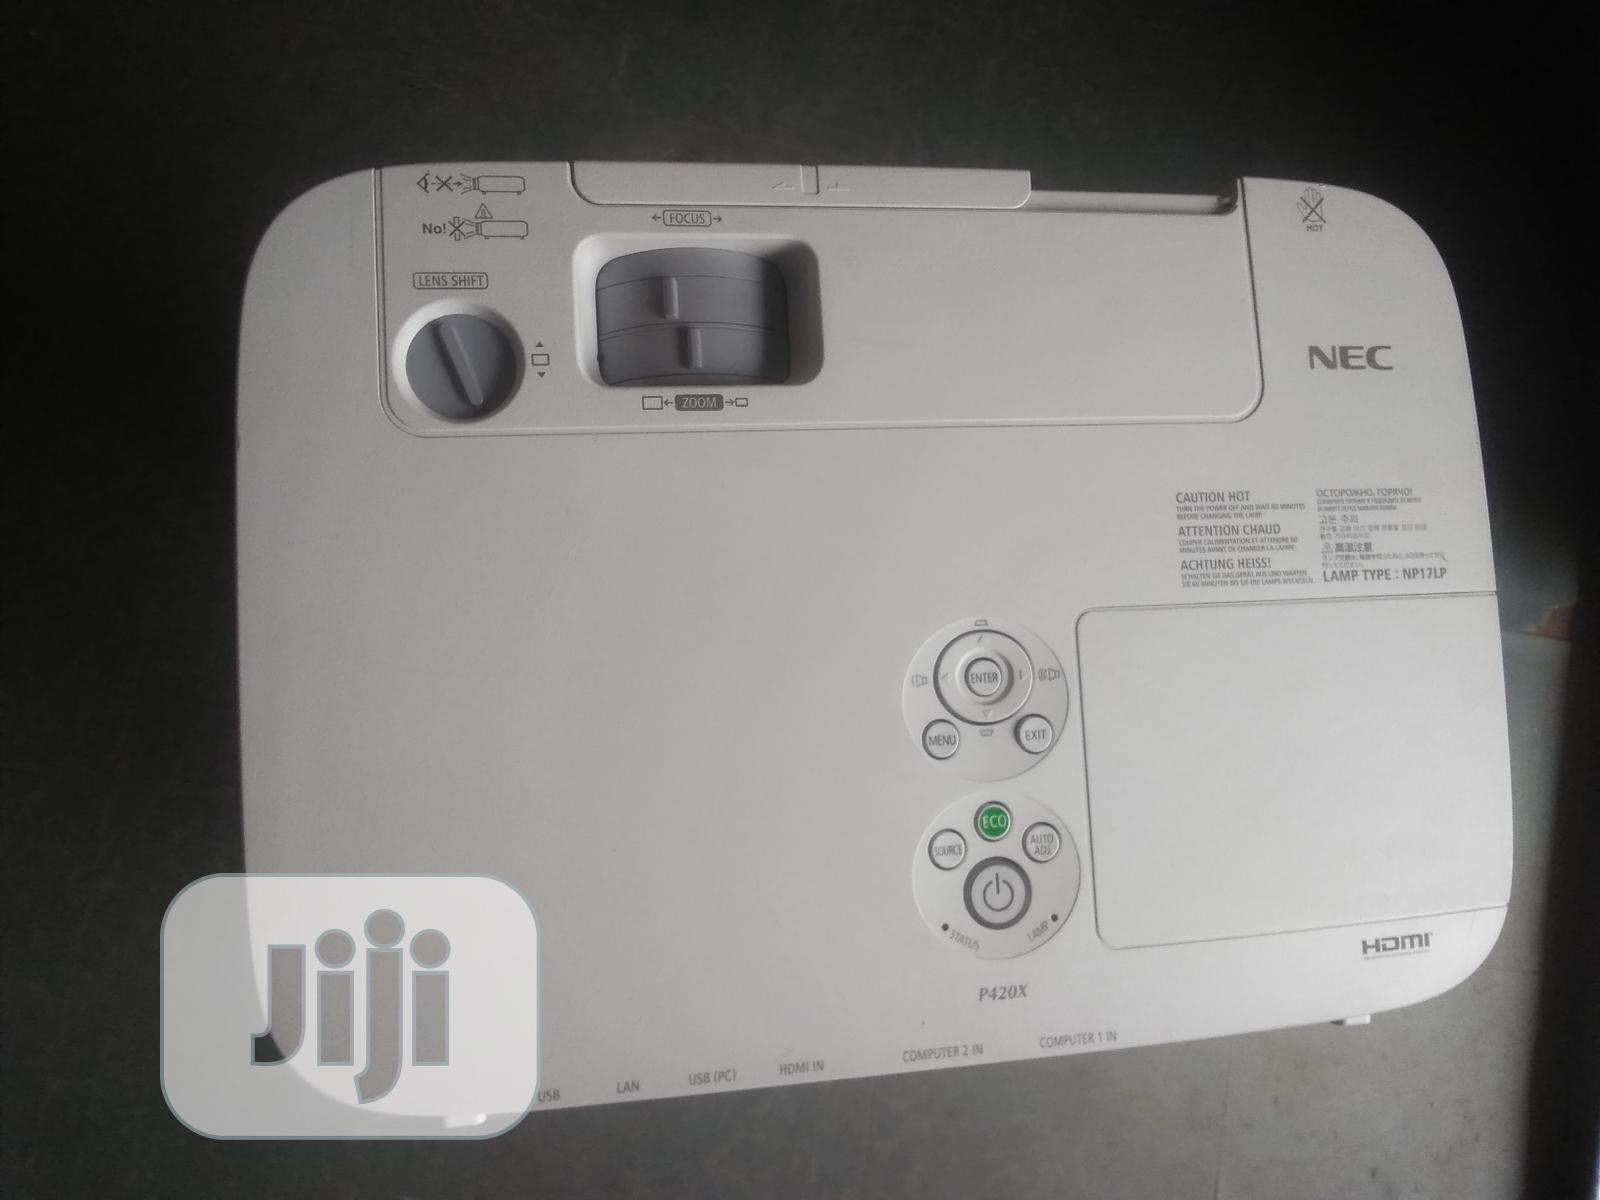 Archive: NEC P420X Projector 4,200 Lumens